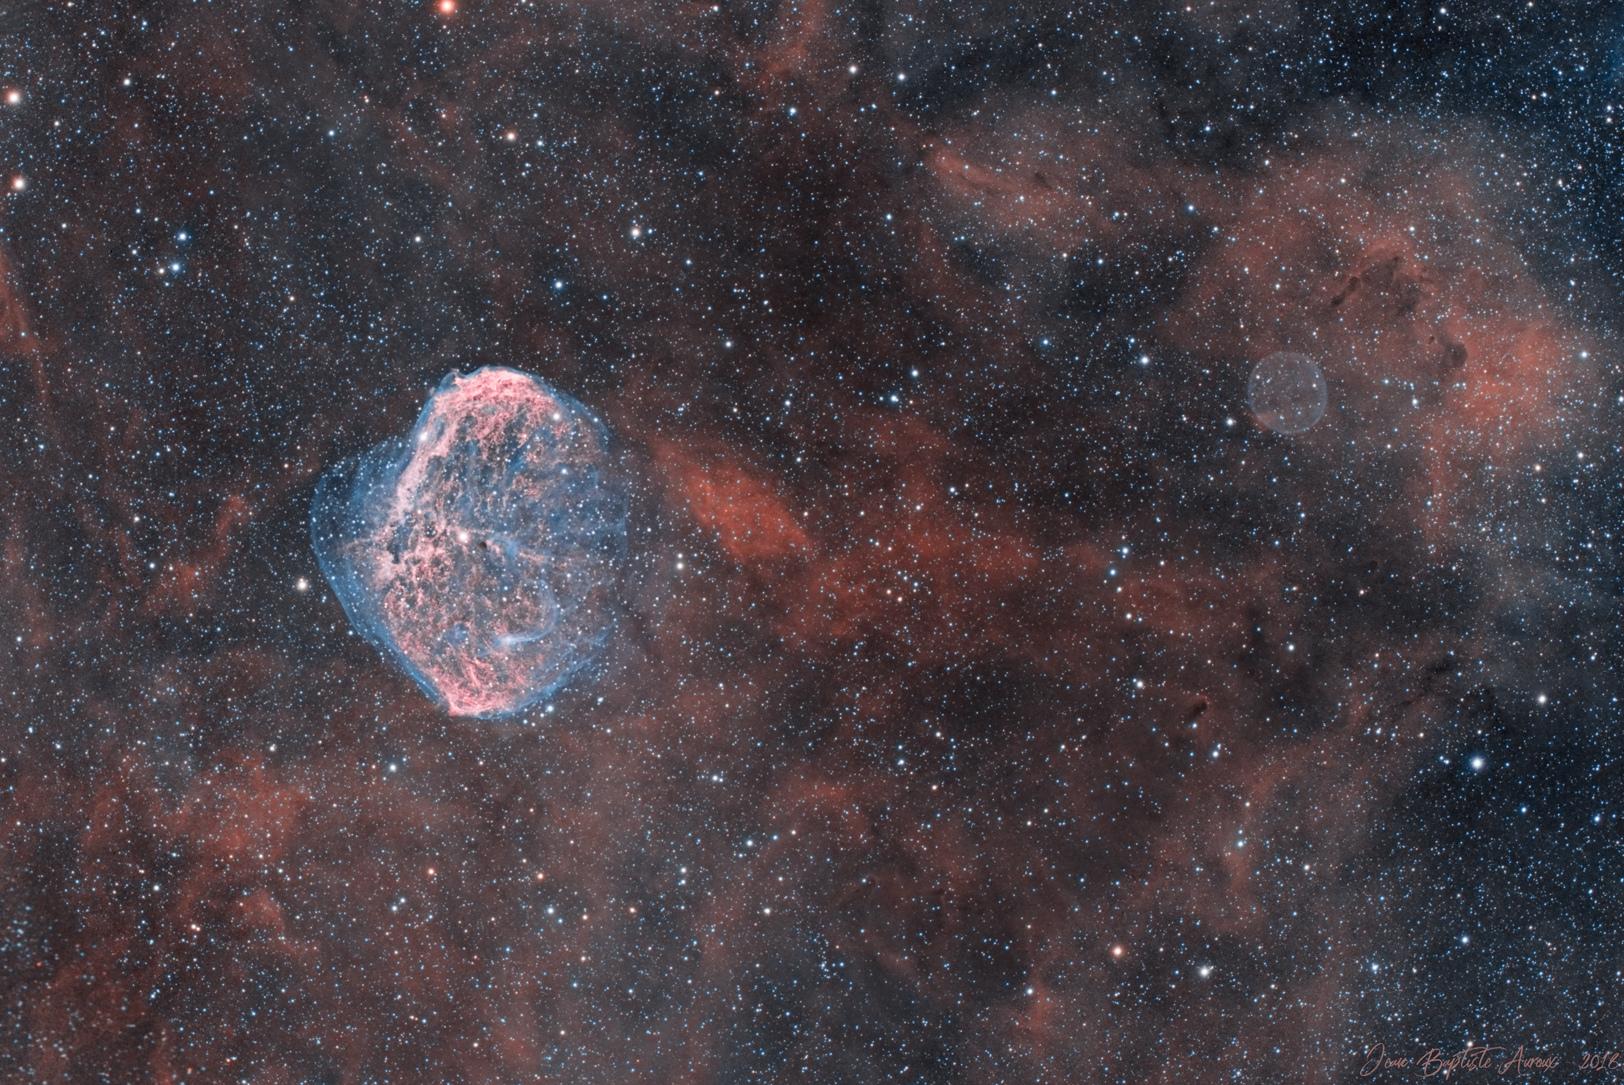 large.NGC6888bulle_finale_crop.jpg.211a989b692921cd06f4e3e5410afd32.jpg